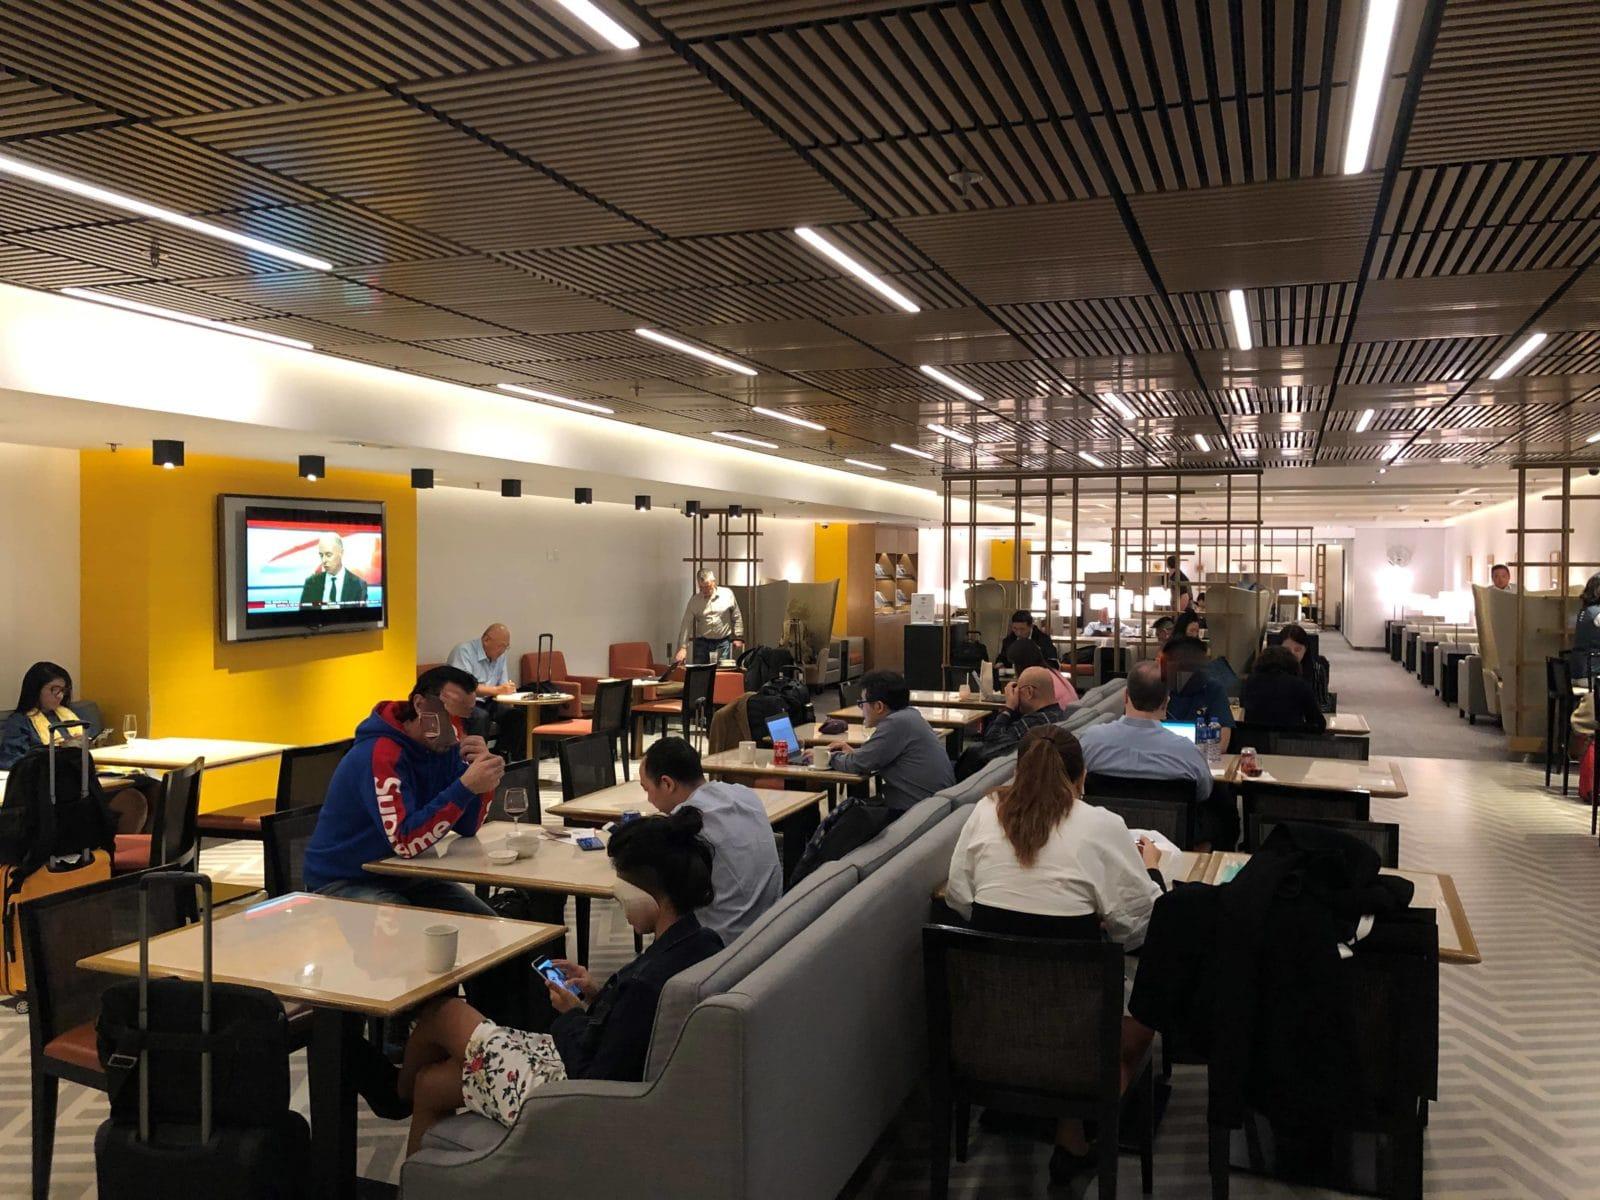 Singapore Airlines SilverKris Lounge Hong Kong Blick in die Lounge